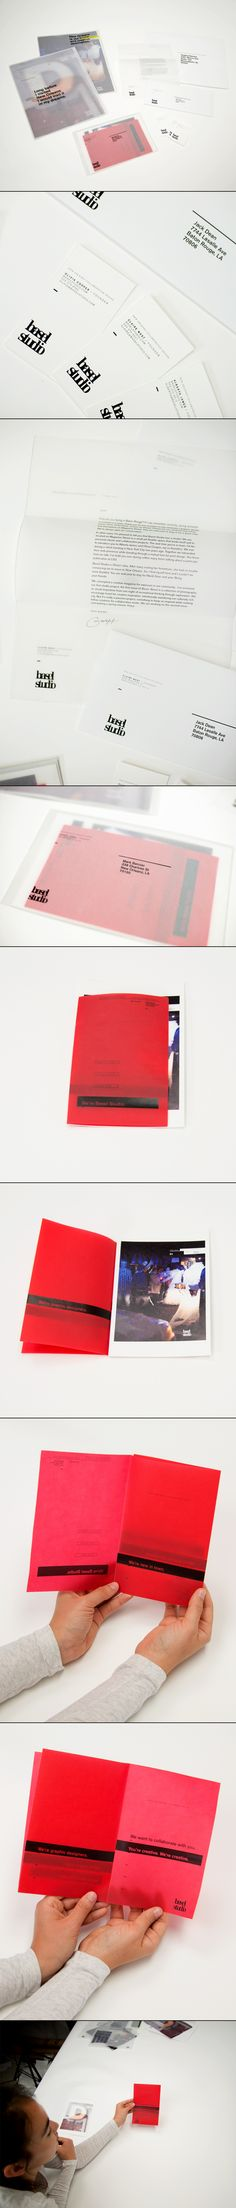 Basel Studio by Liz Barnes, via Behance